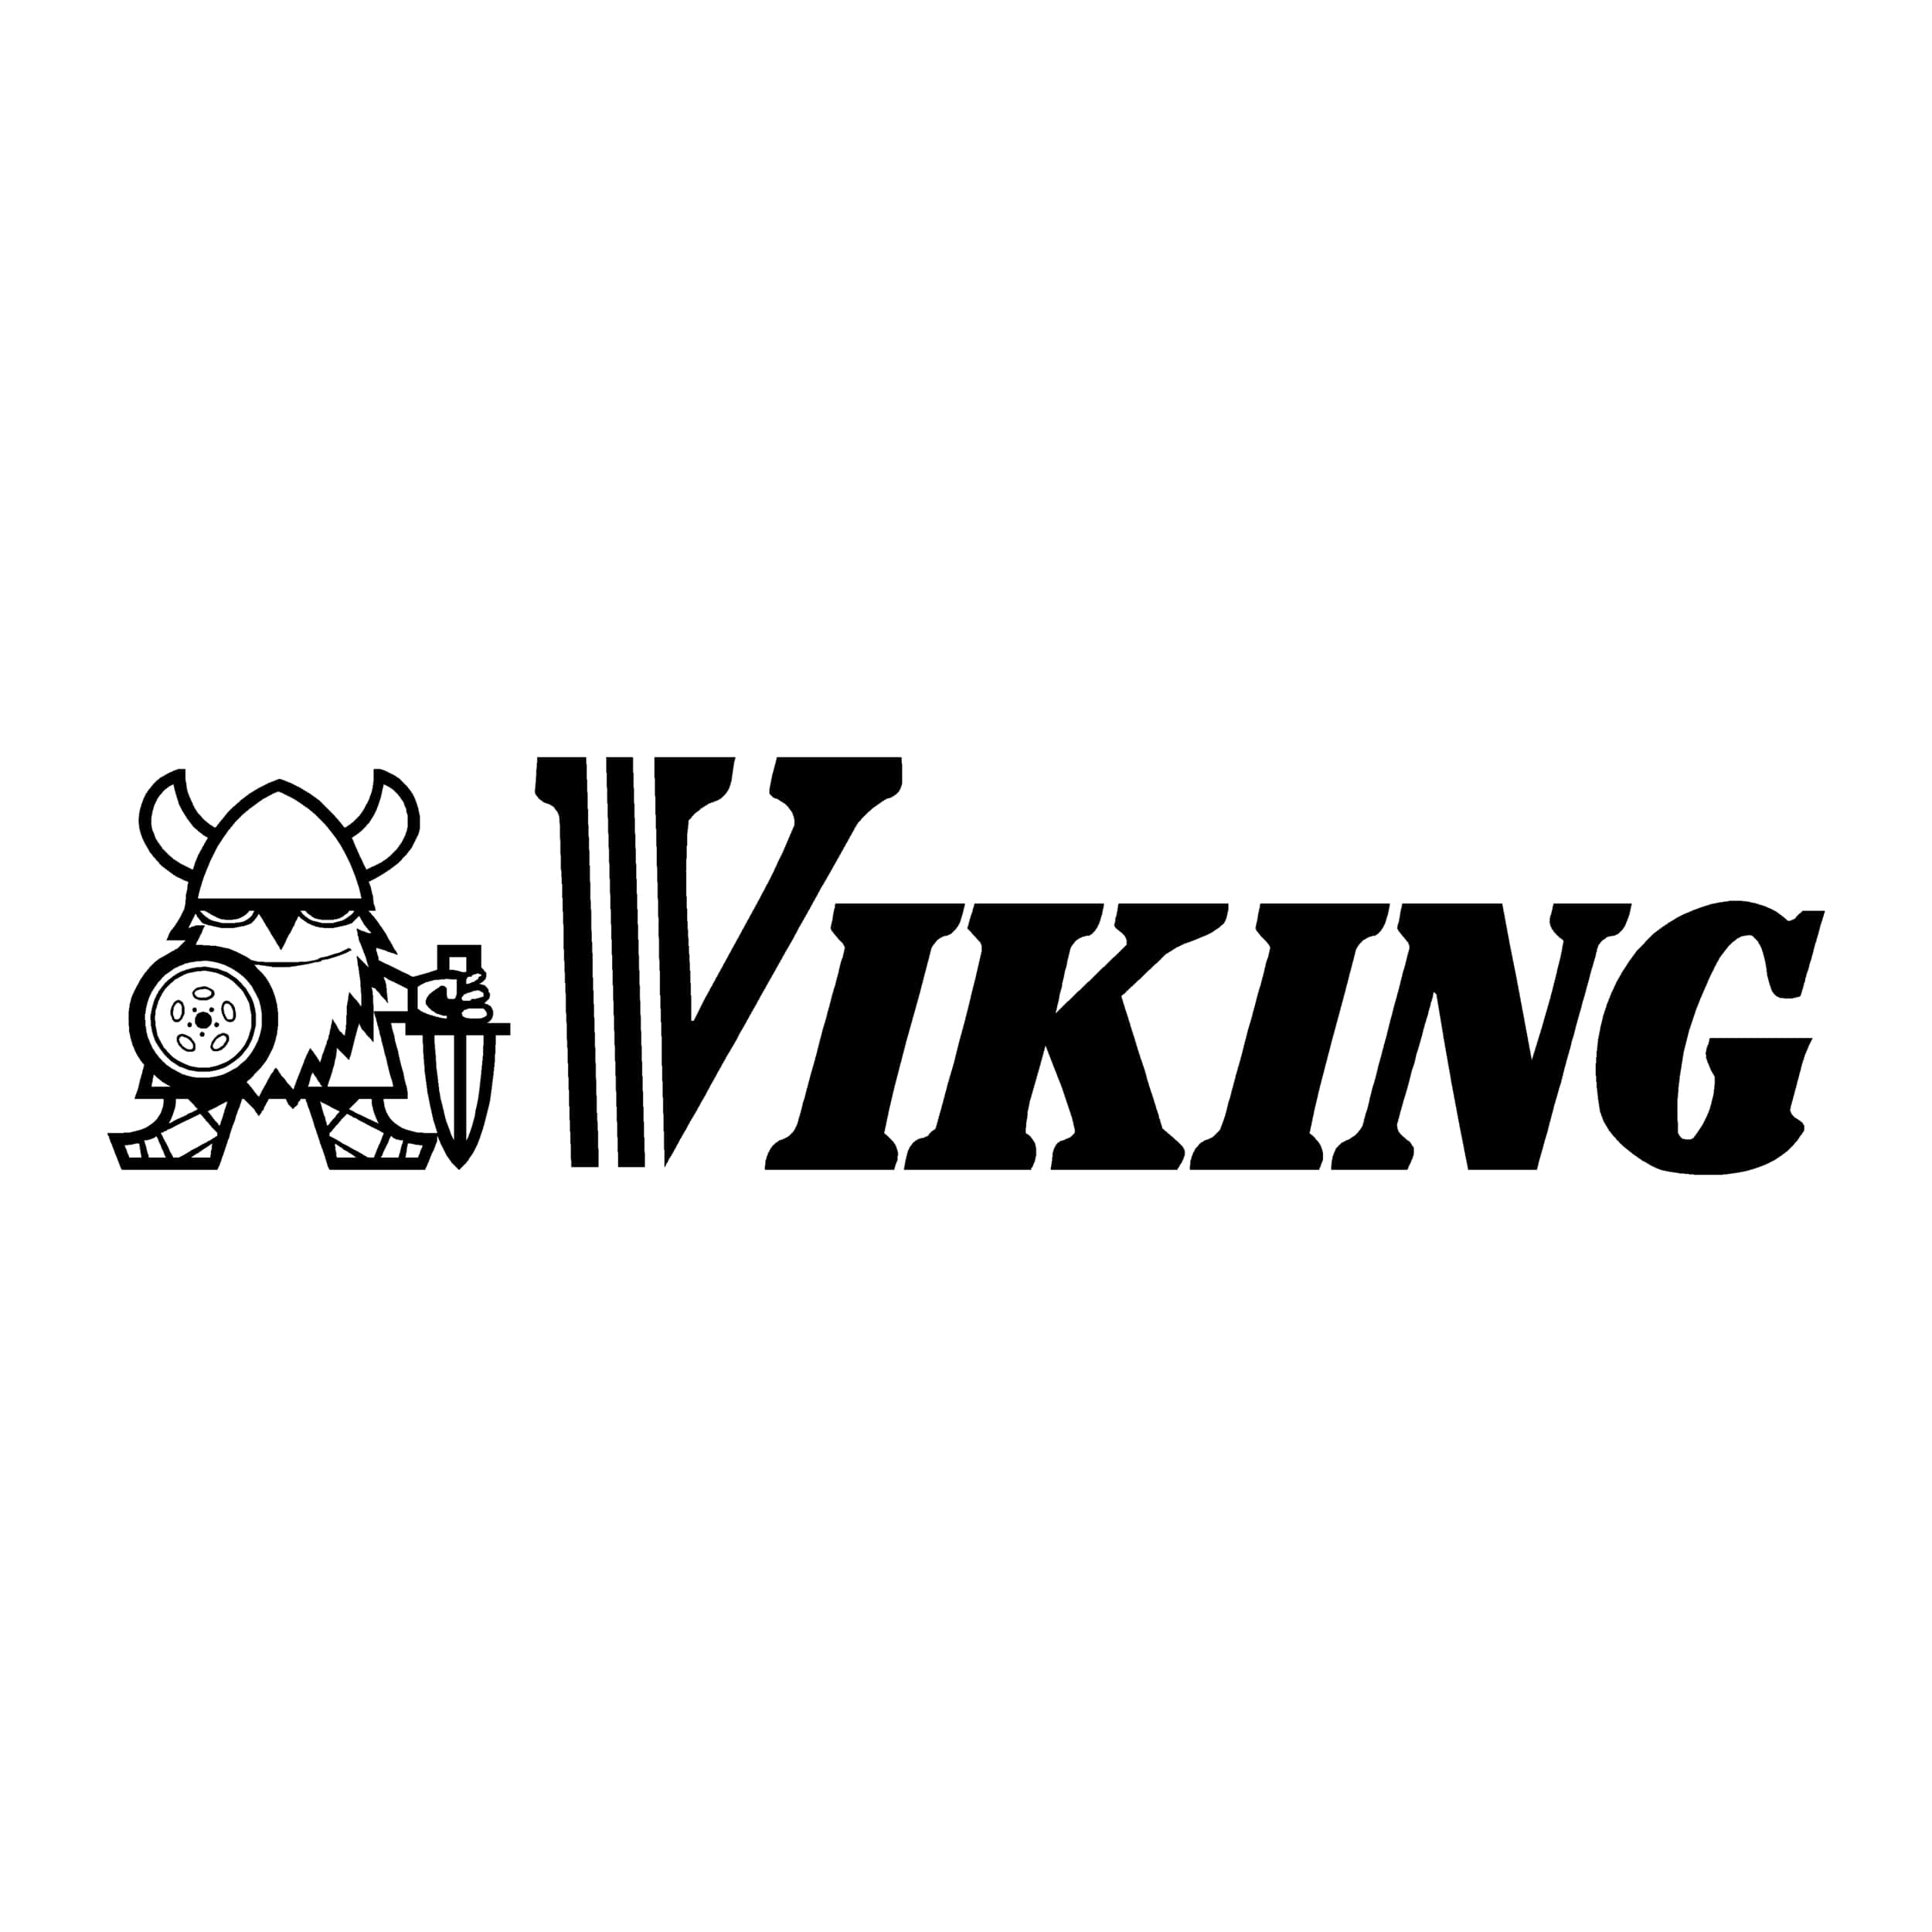 stickers-viking-ref-1-tuning-amortisseur-4x4-tout-terrain-car-auto-moto-camion-competition-deco-rallye-autocollant-min